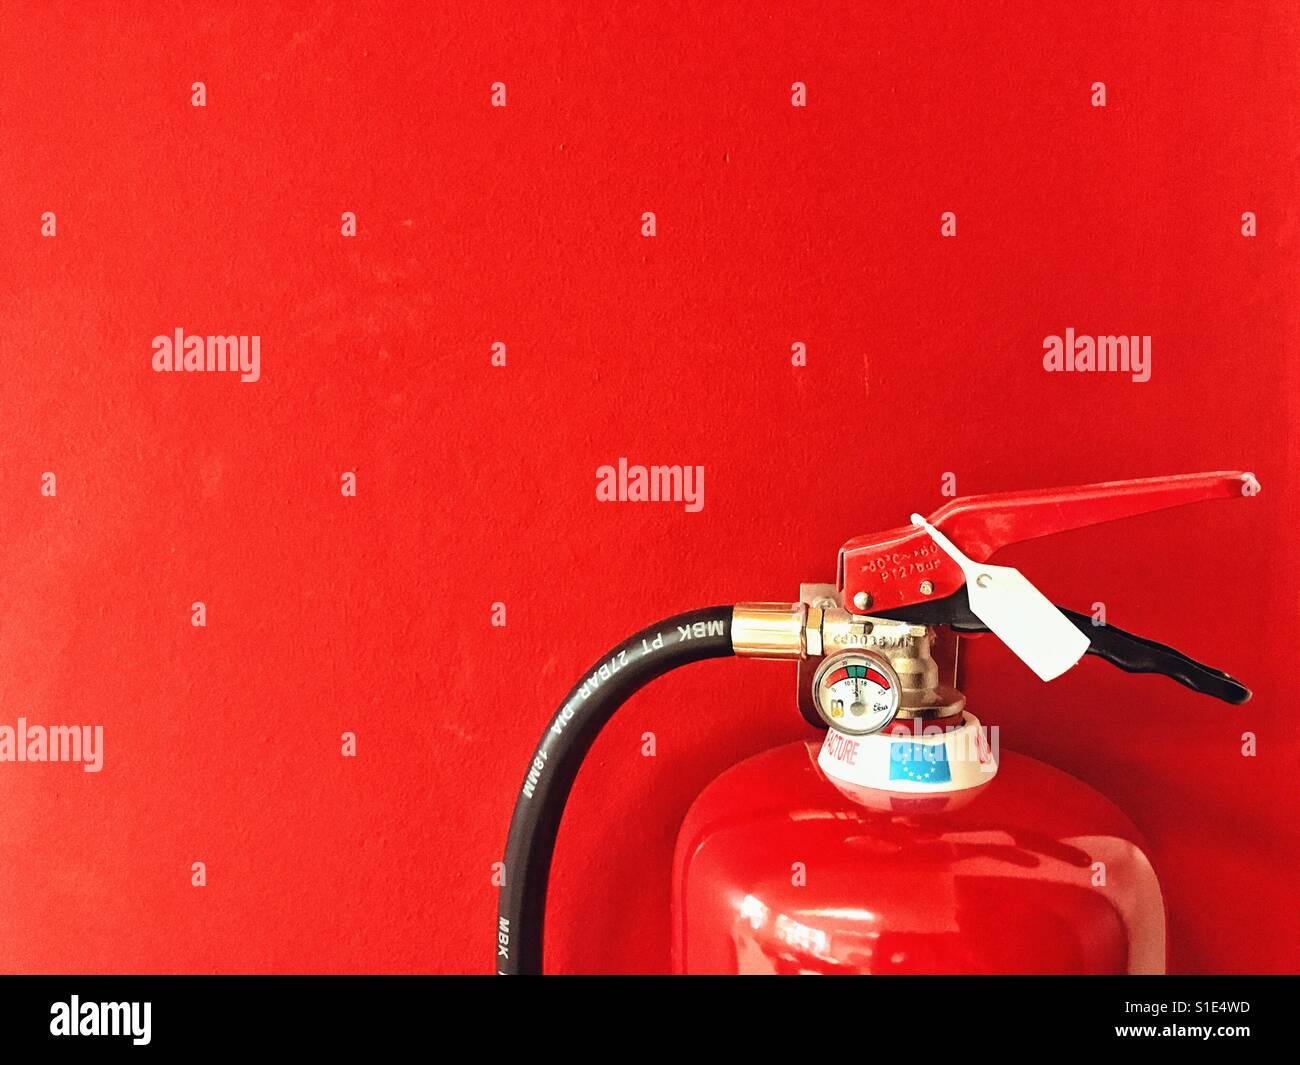 Detalle de extintor contra un fondo rojo. Imagen De Stock